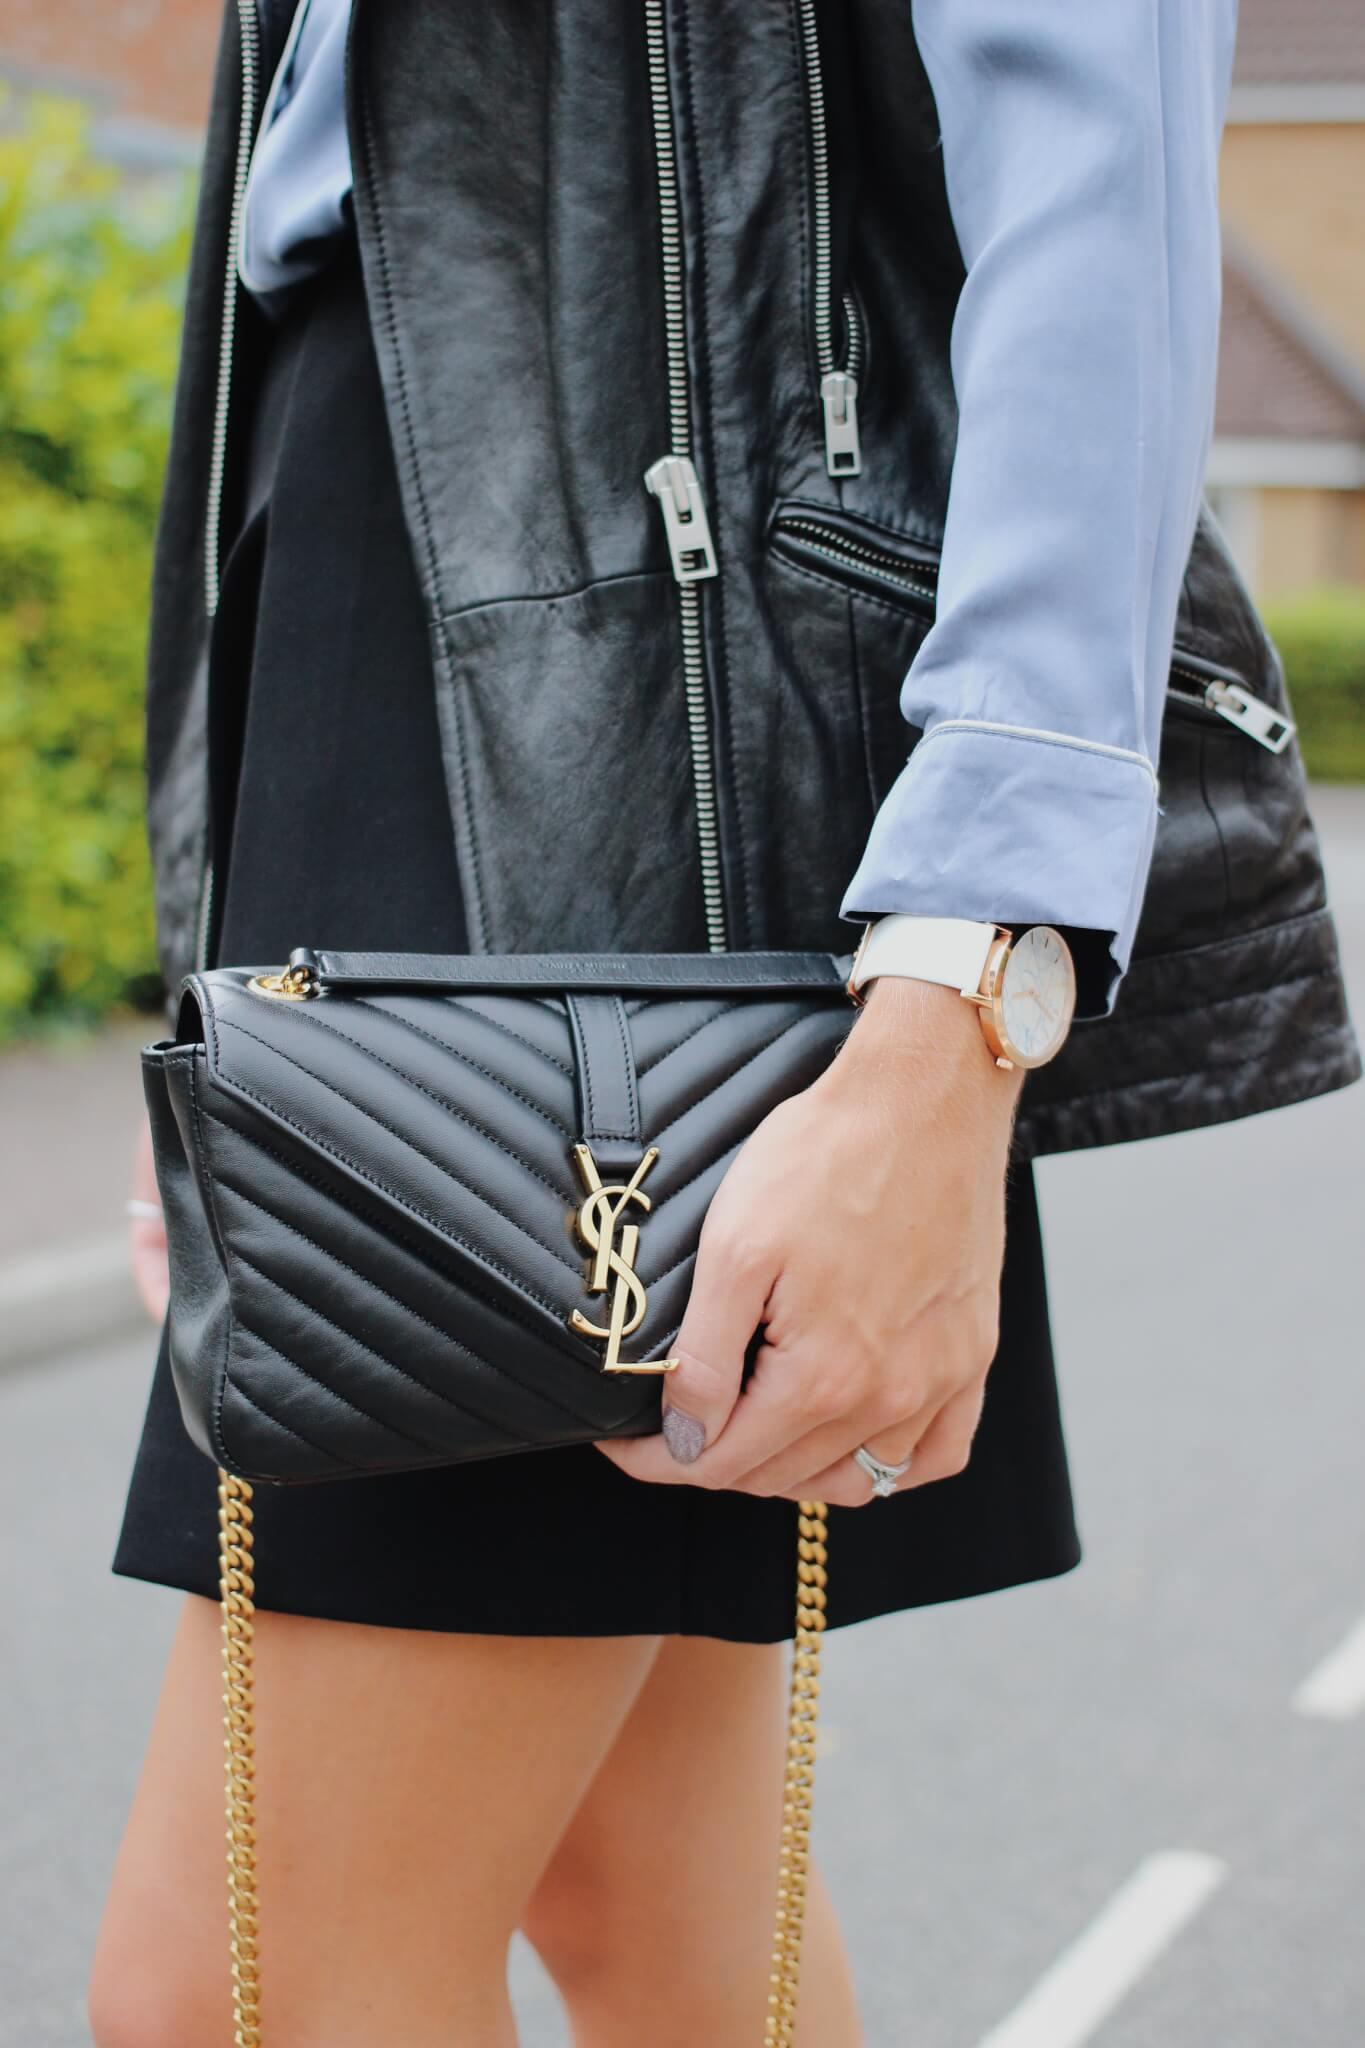 Why you need a Saint Laurent Handbag